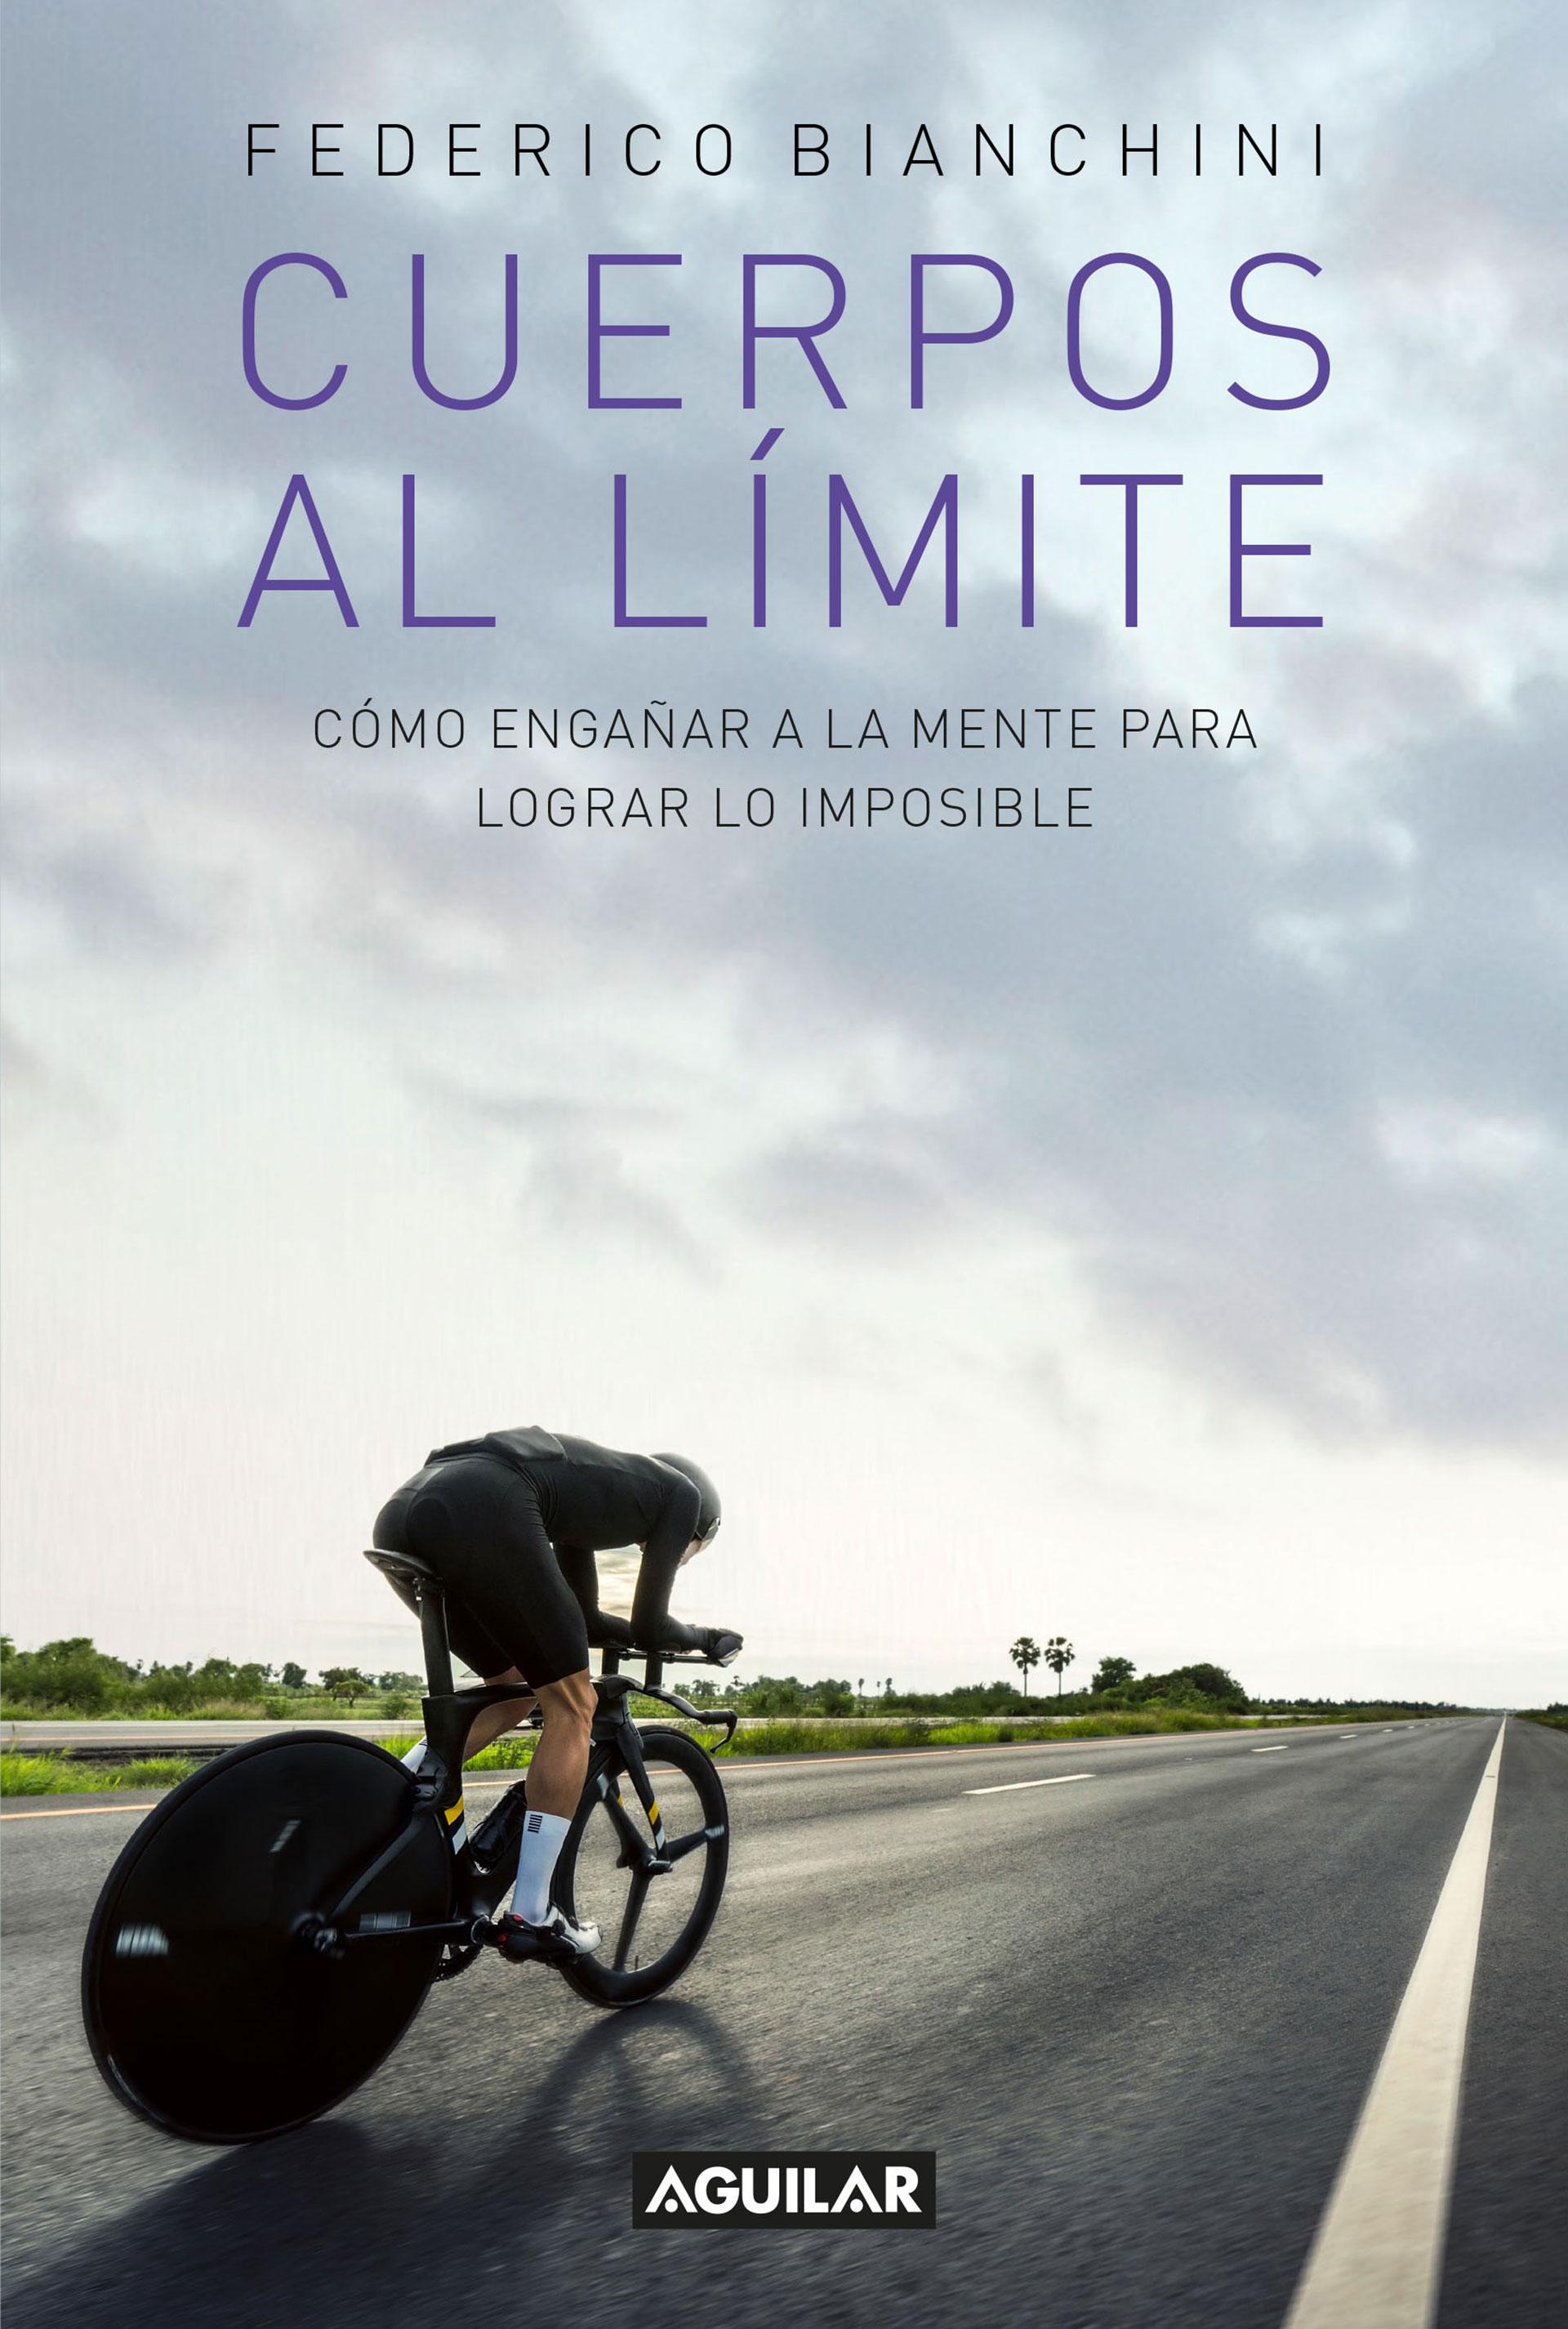 Federico Bianchini - Cuerpos al limite SF 2